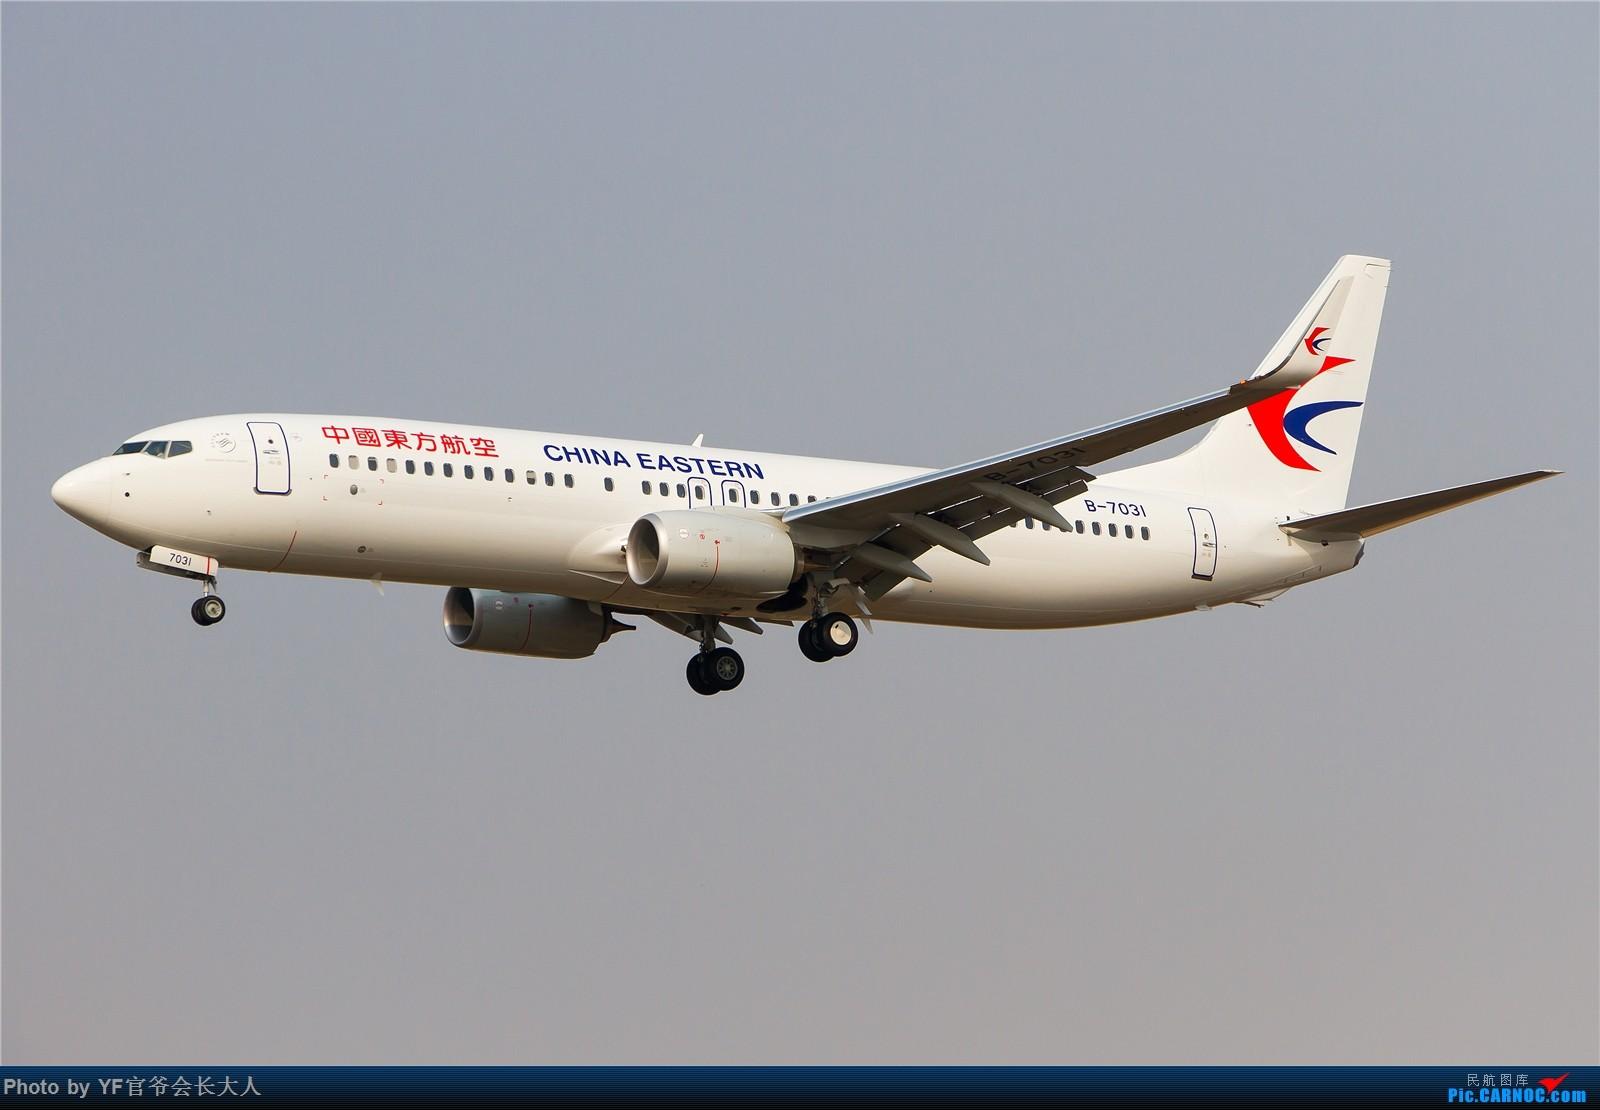 Re:[原创]【ZYTX】【1600*1066】论坛首发:俄罗斯艾菲航空公司波音757-28A,注册号:EI-EWT,还有757斯基以及最近新拍机点拍的一些好货 BOEING 737-800 B-7031 中国沈阳桃仙国际机场